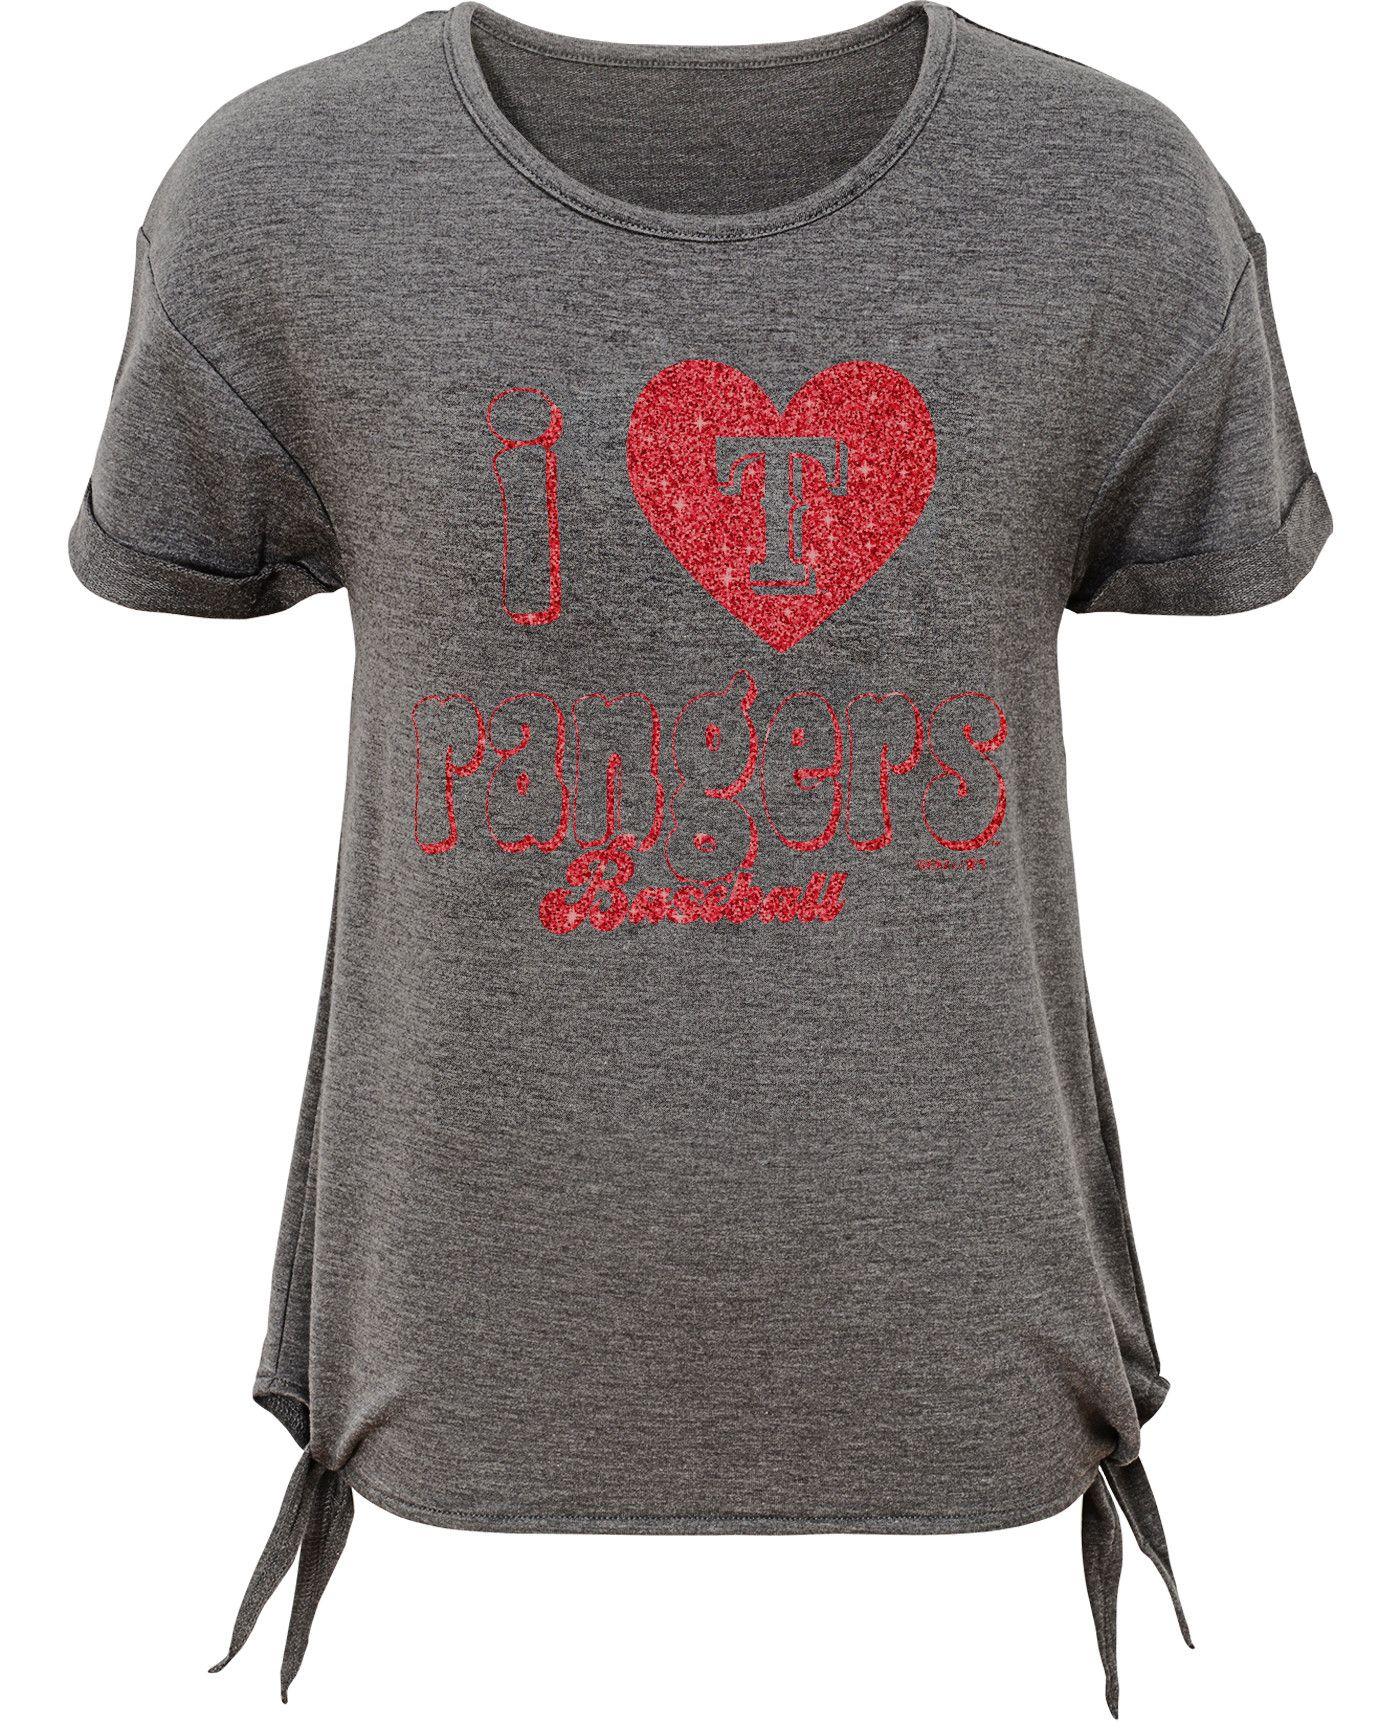 Gen2 Youth Girls' Texas Rangers Side Ties Tri-Blend T-Shirt